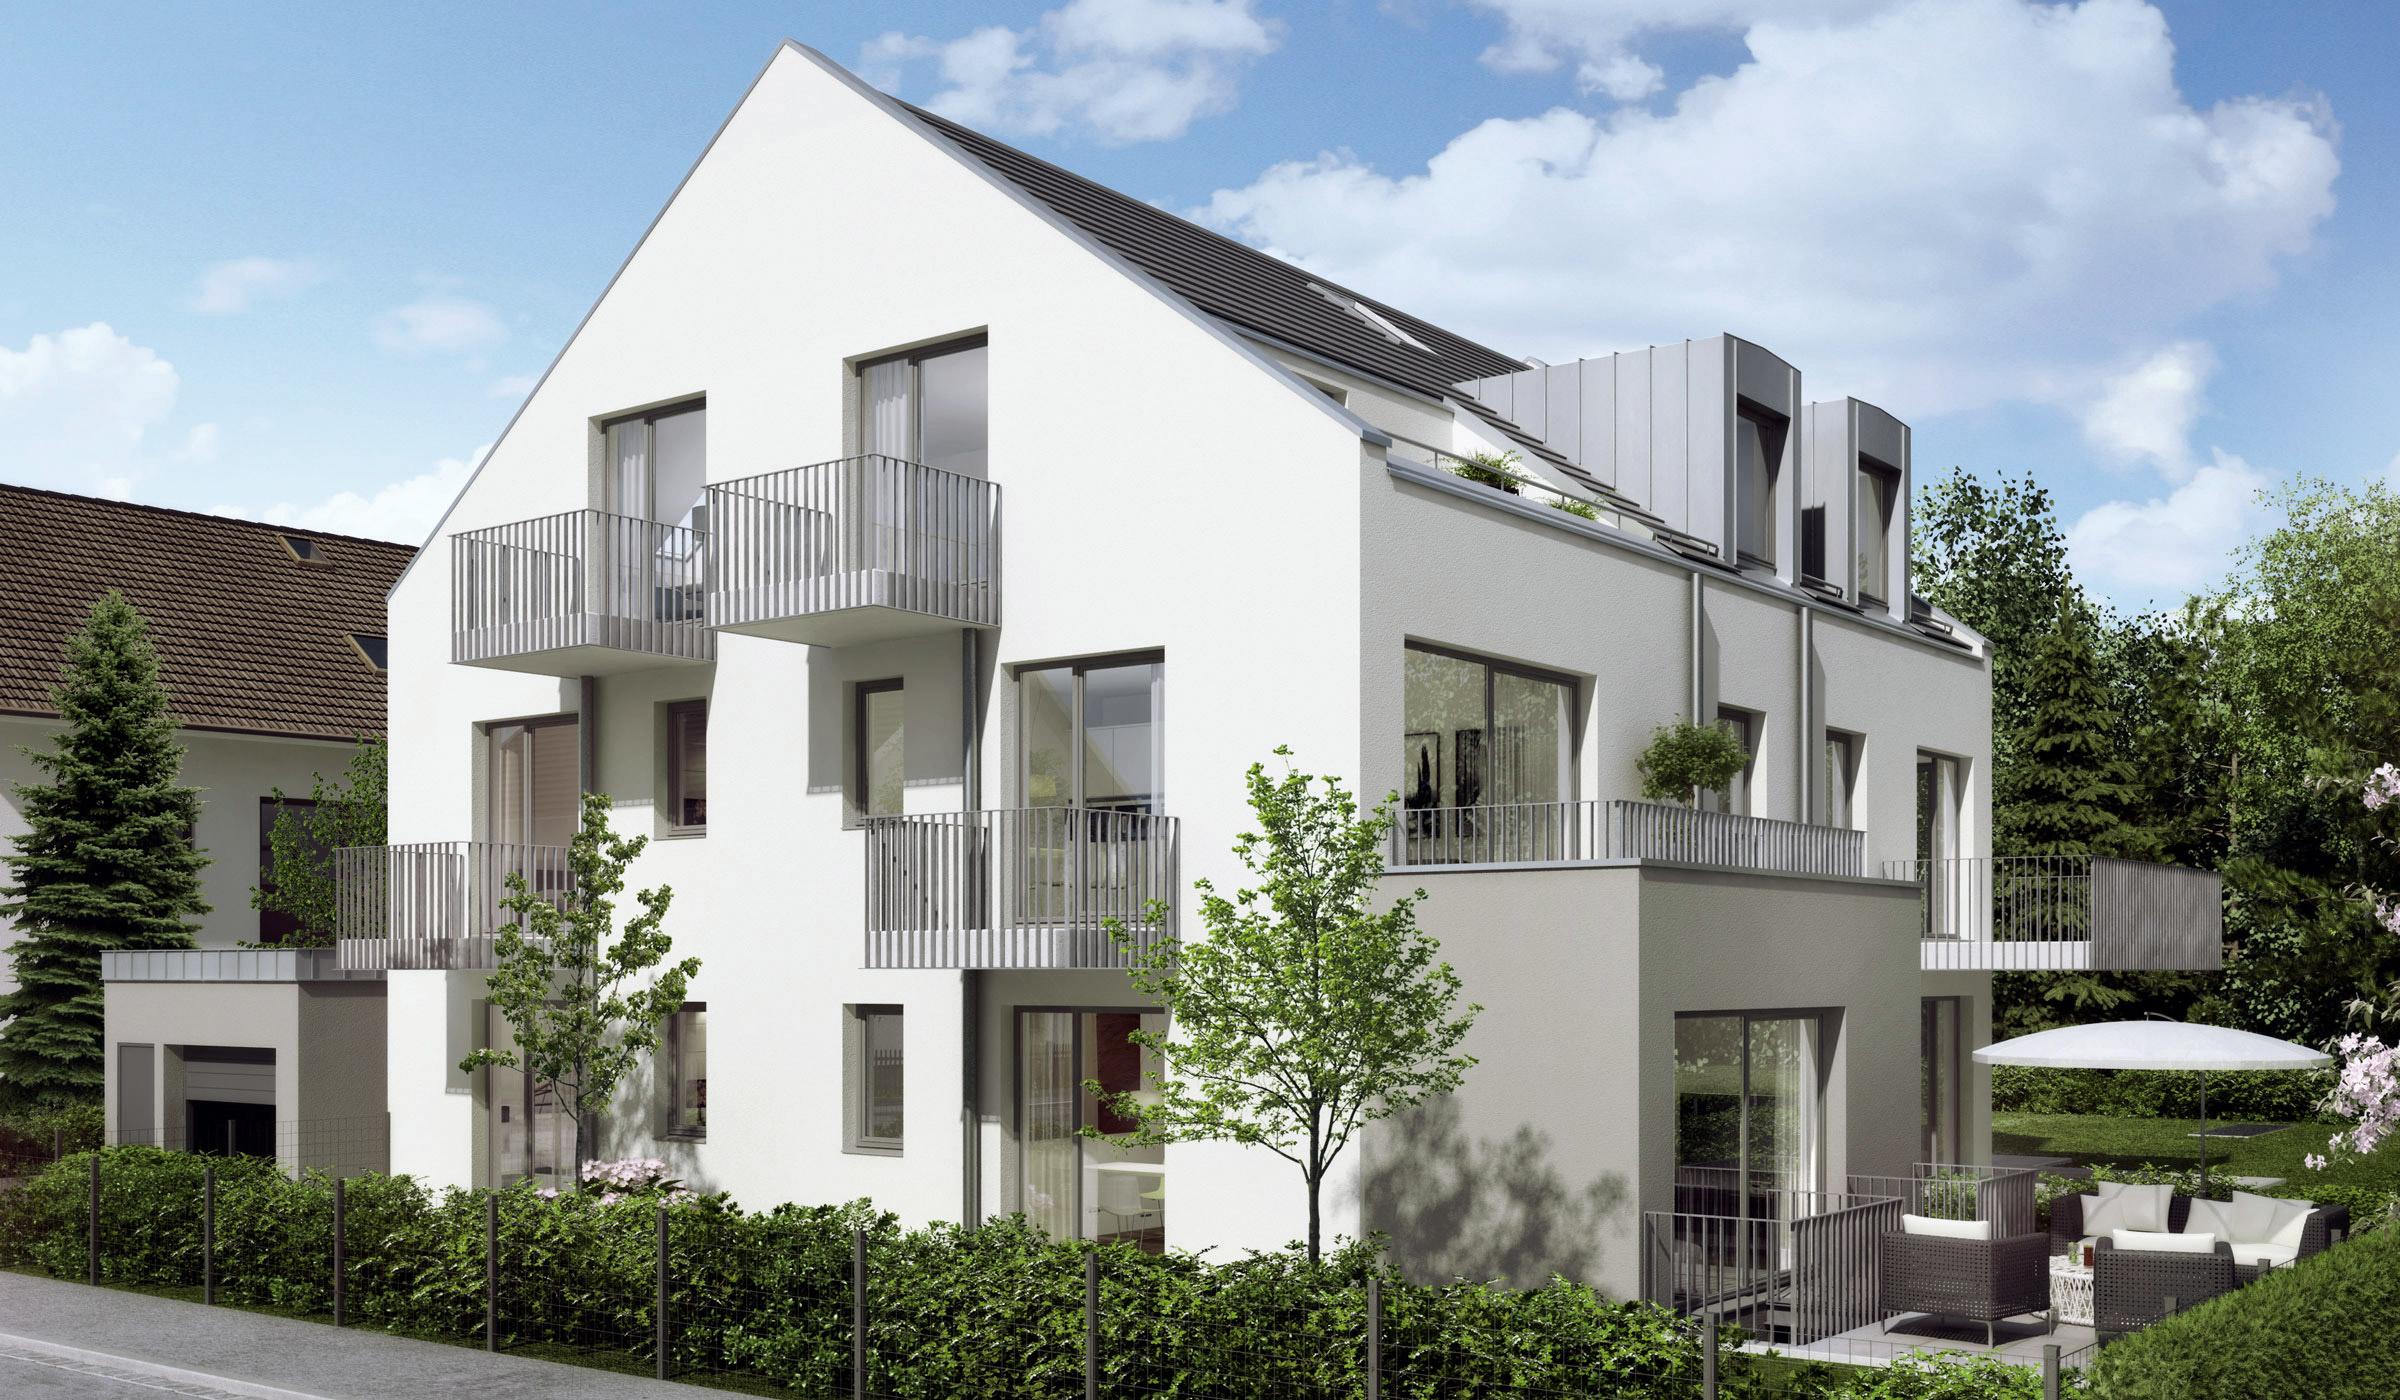 3BAU-Referenz-Heimdall-Neubau-Mehrfamilienhaus-Waldperlach-1a